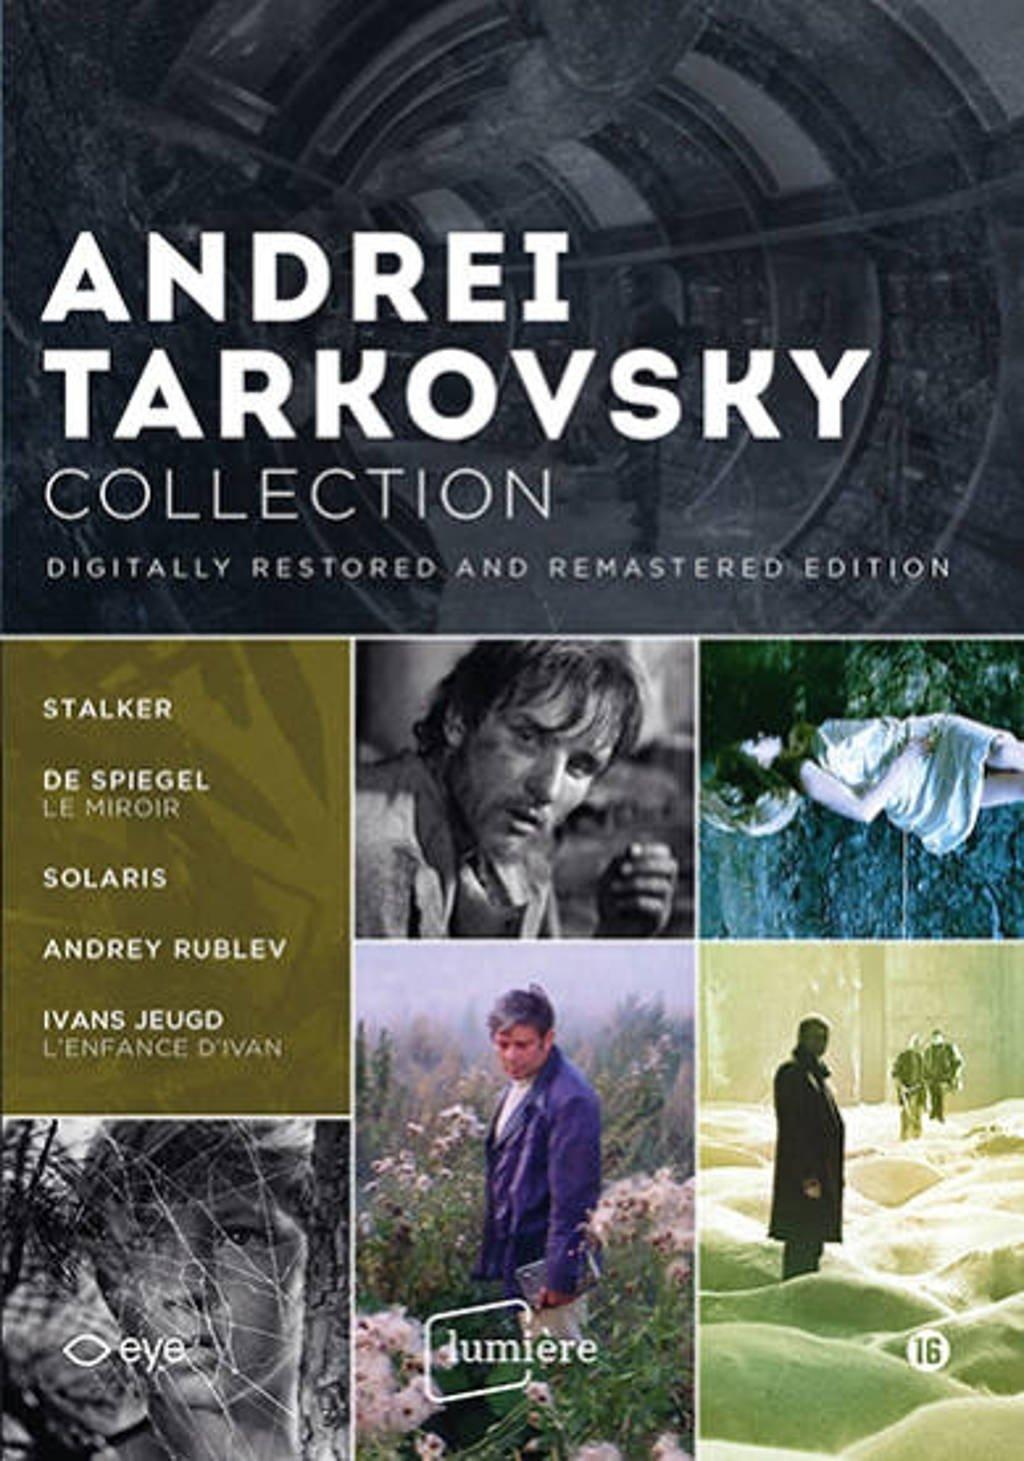 Tarkovsky collection - Remastered (DVD)